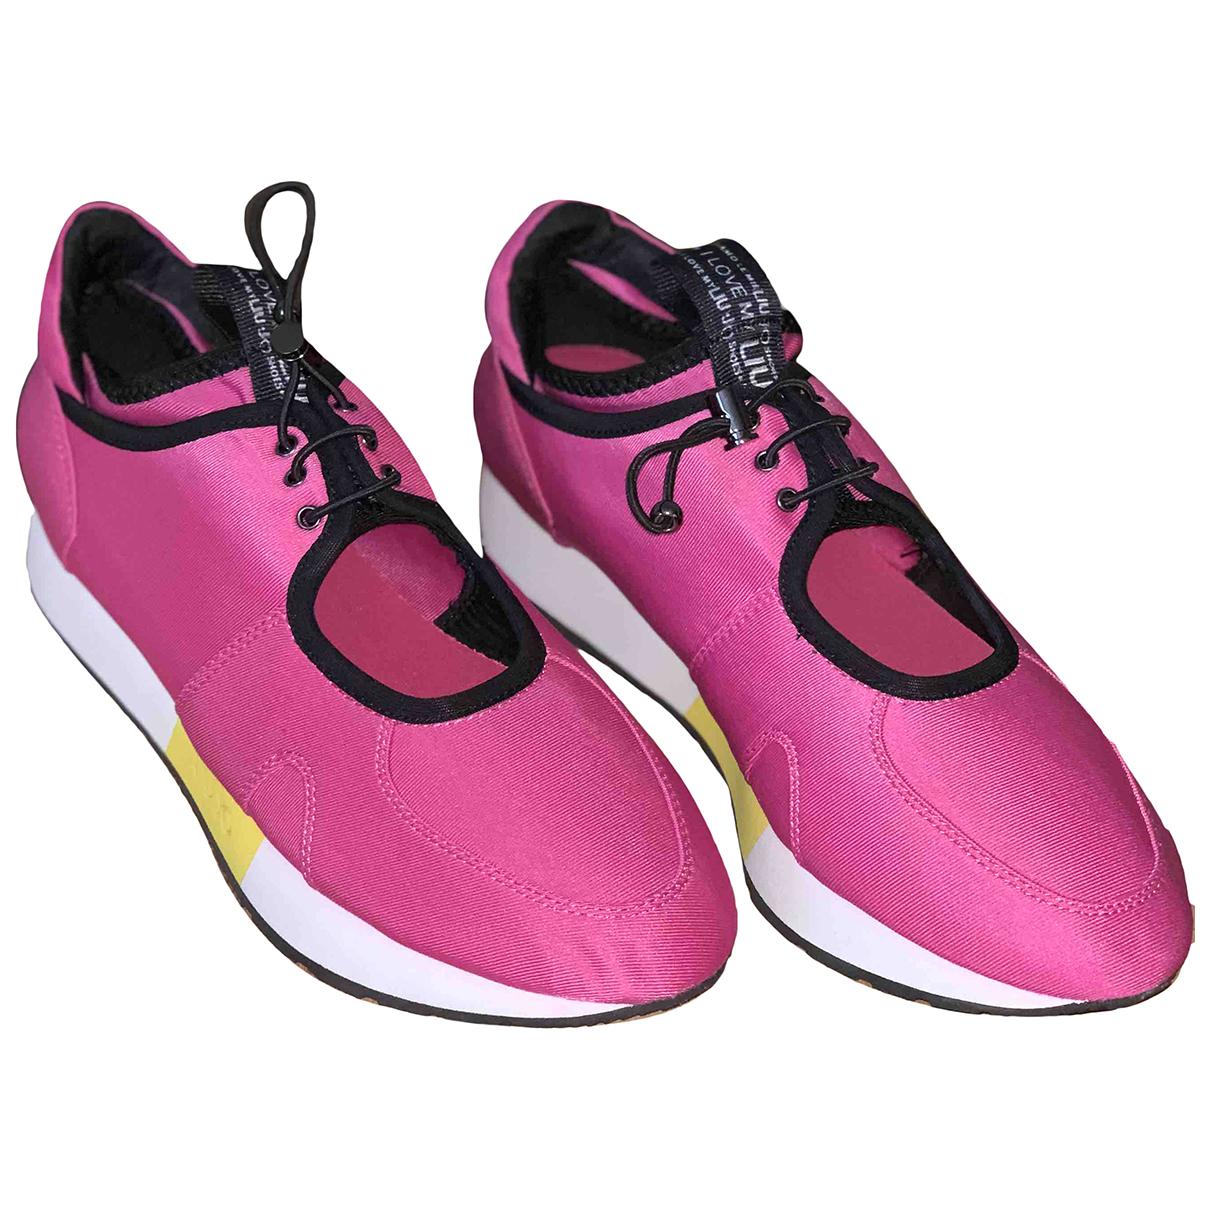 Liu.jo - Baskets   pour femme - rose